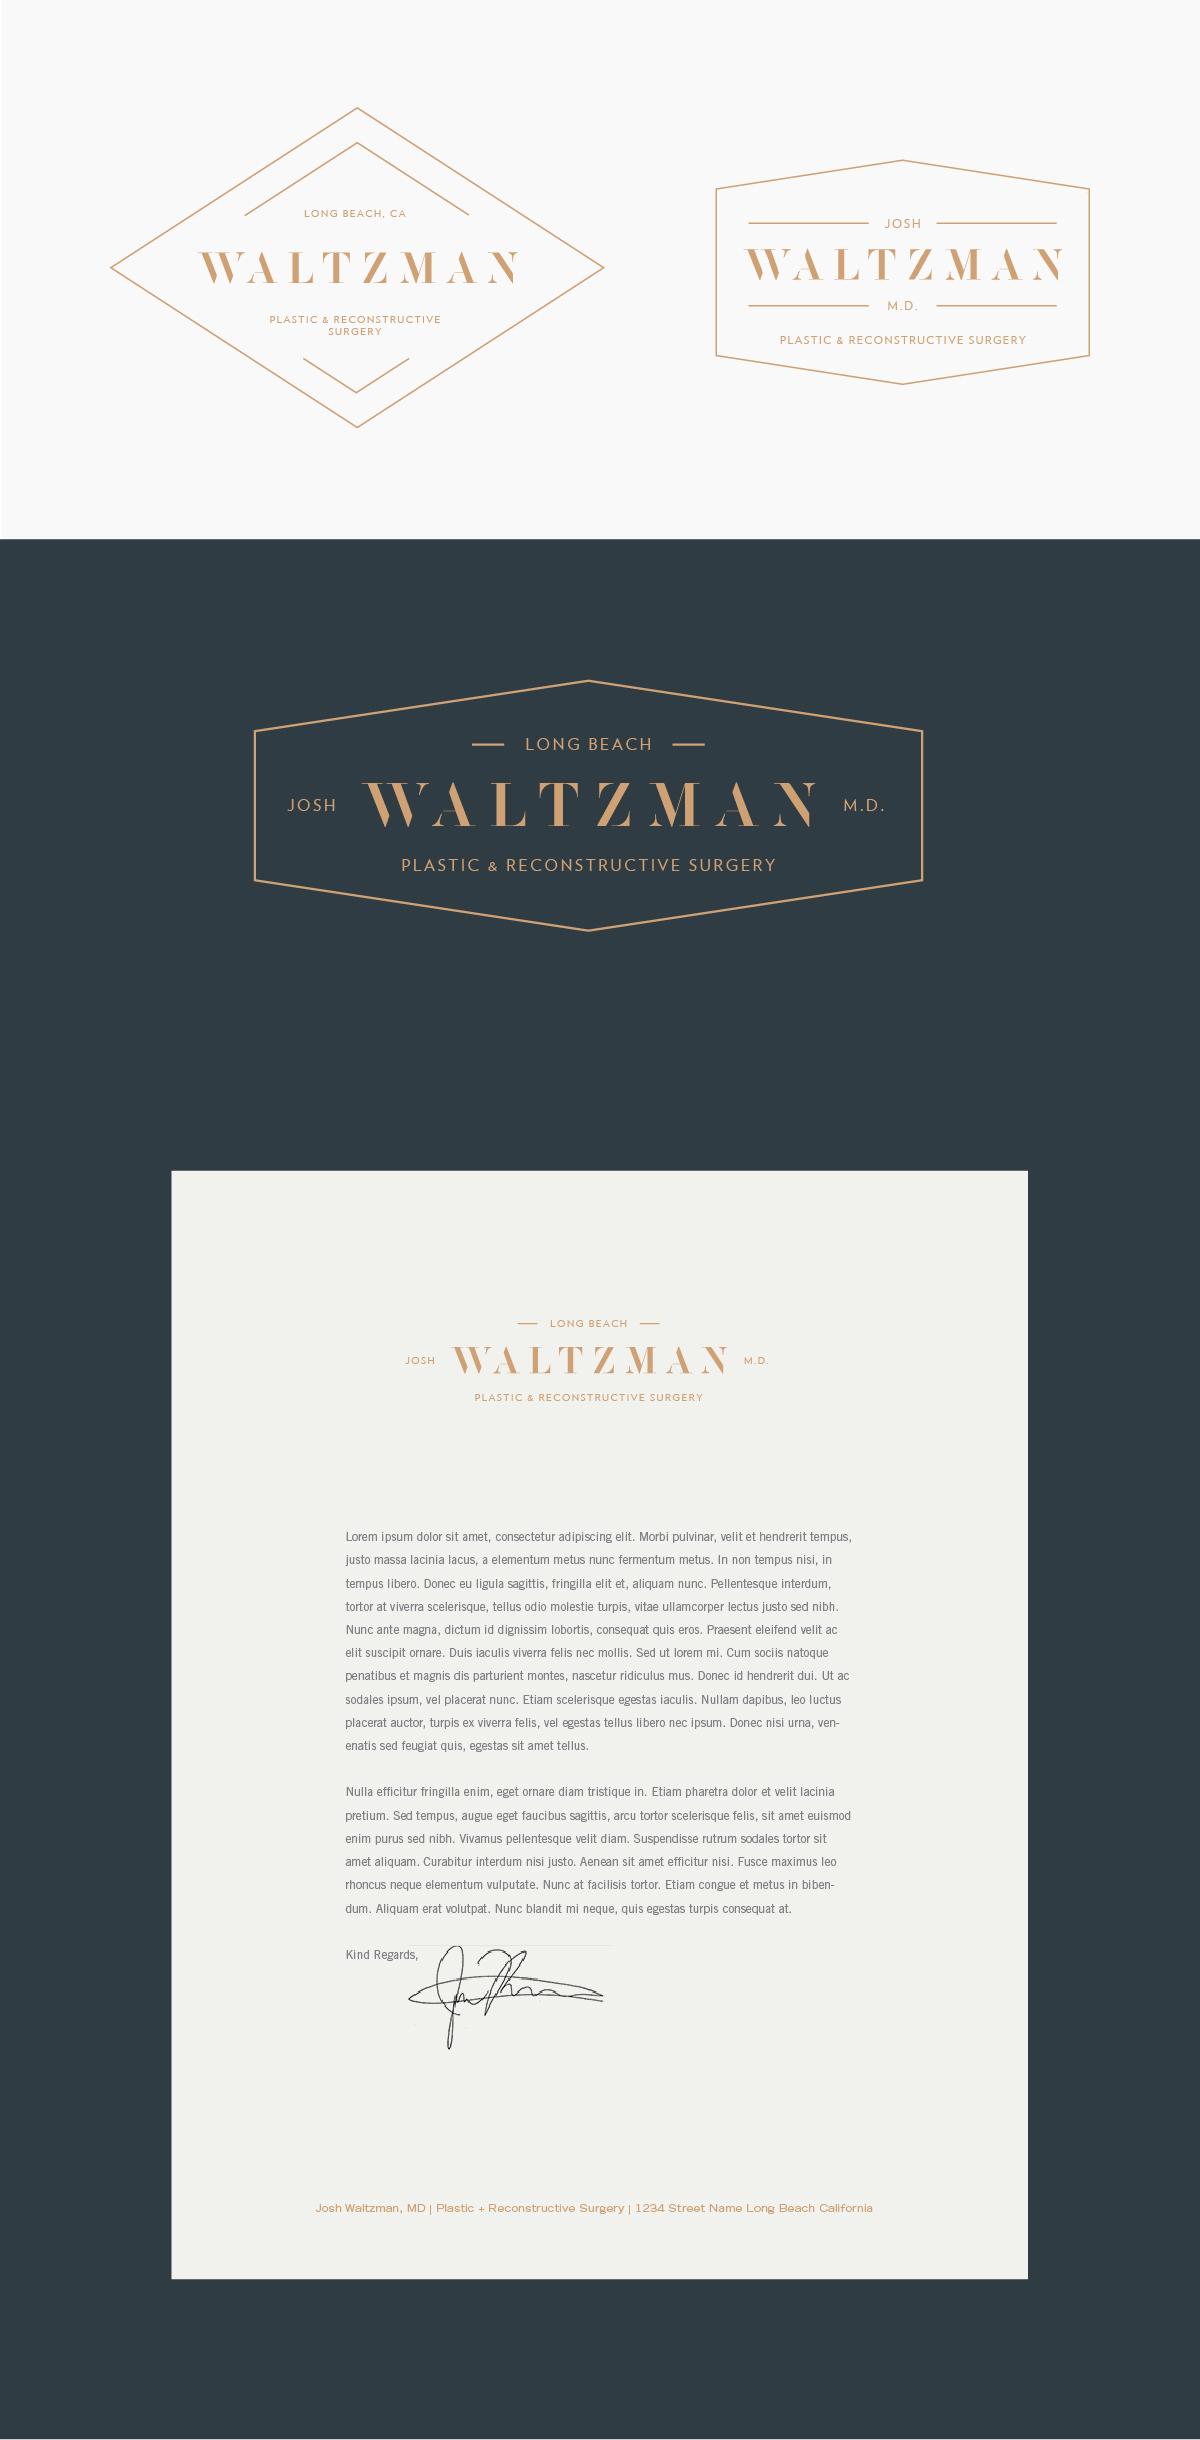 Waltzman-02